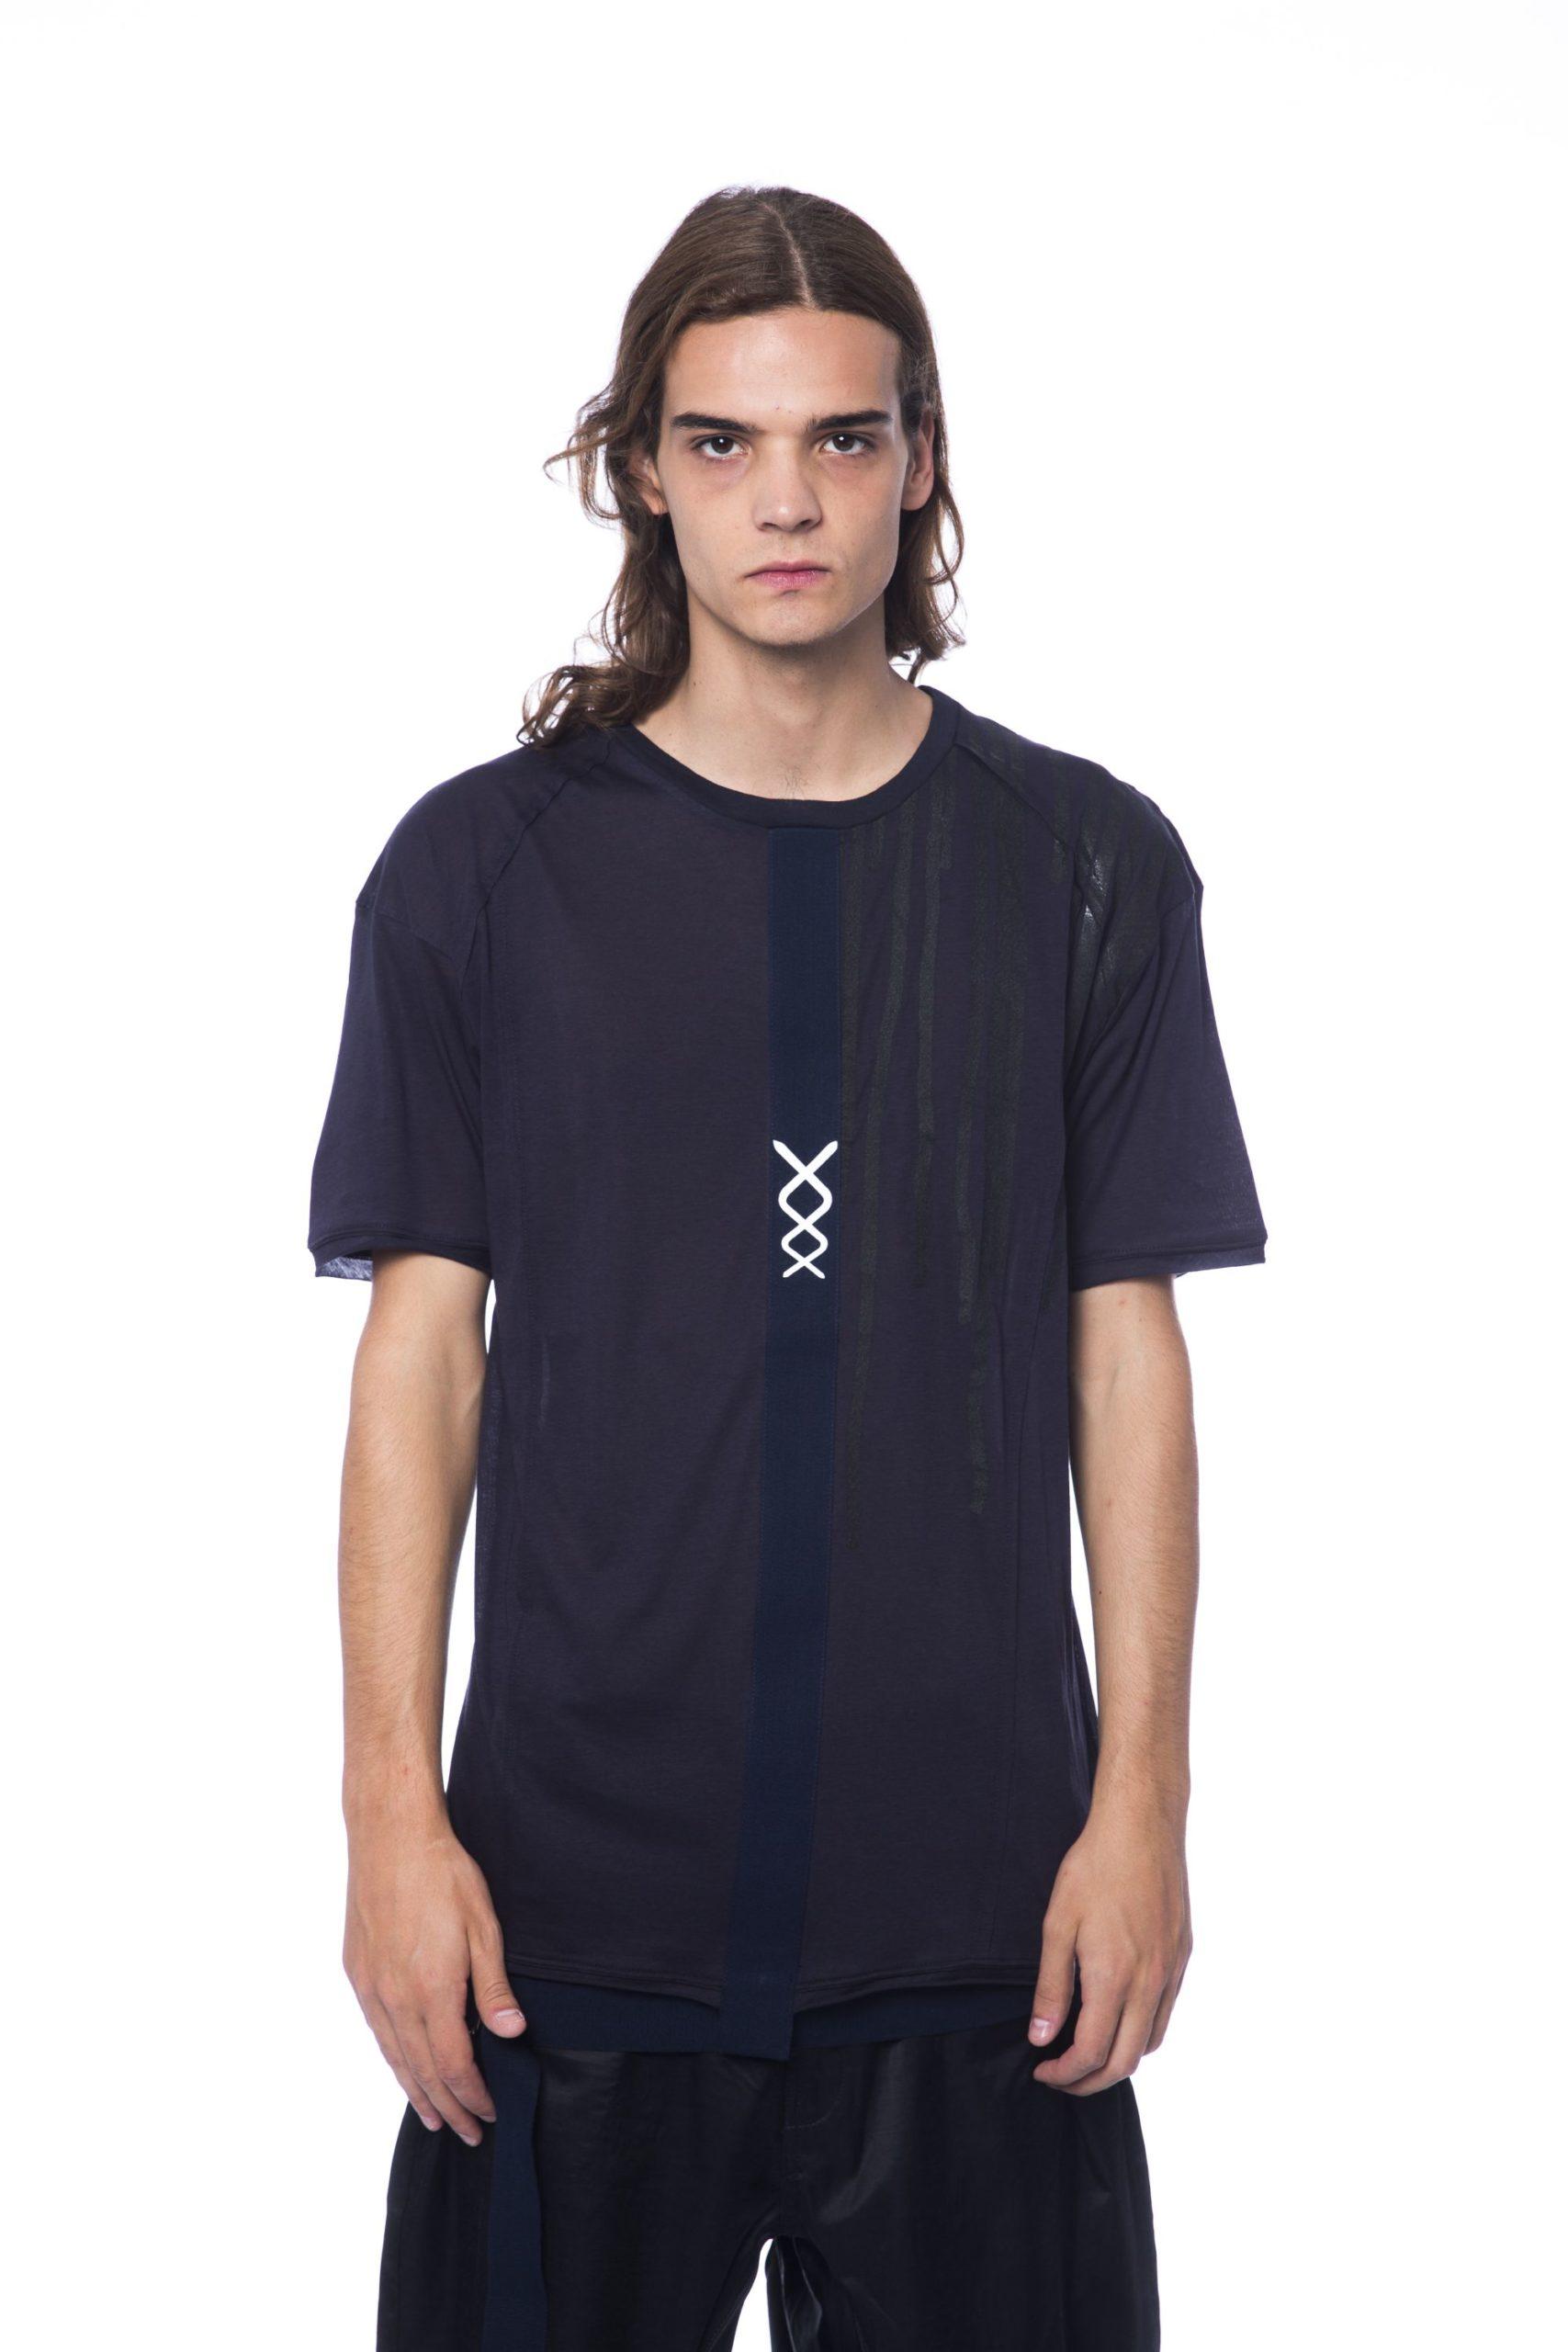 Nicolo Tonetto Men's T-Shirt Blue NI687147 - XS